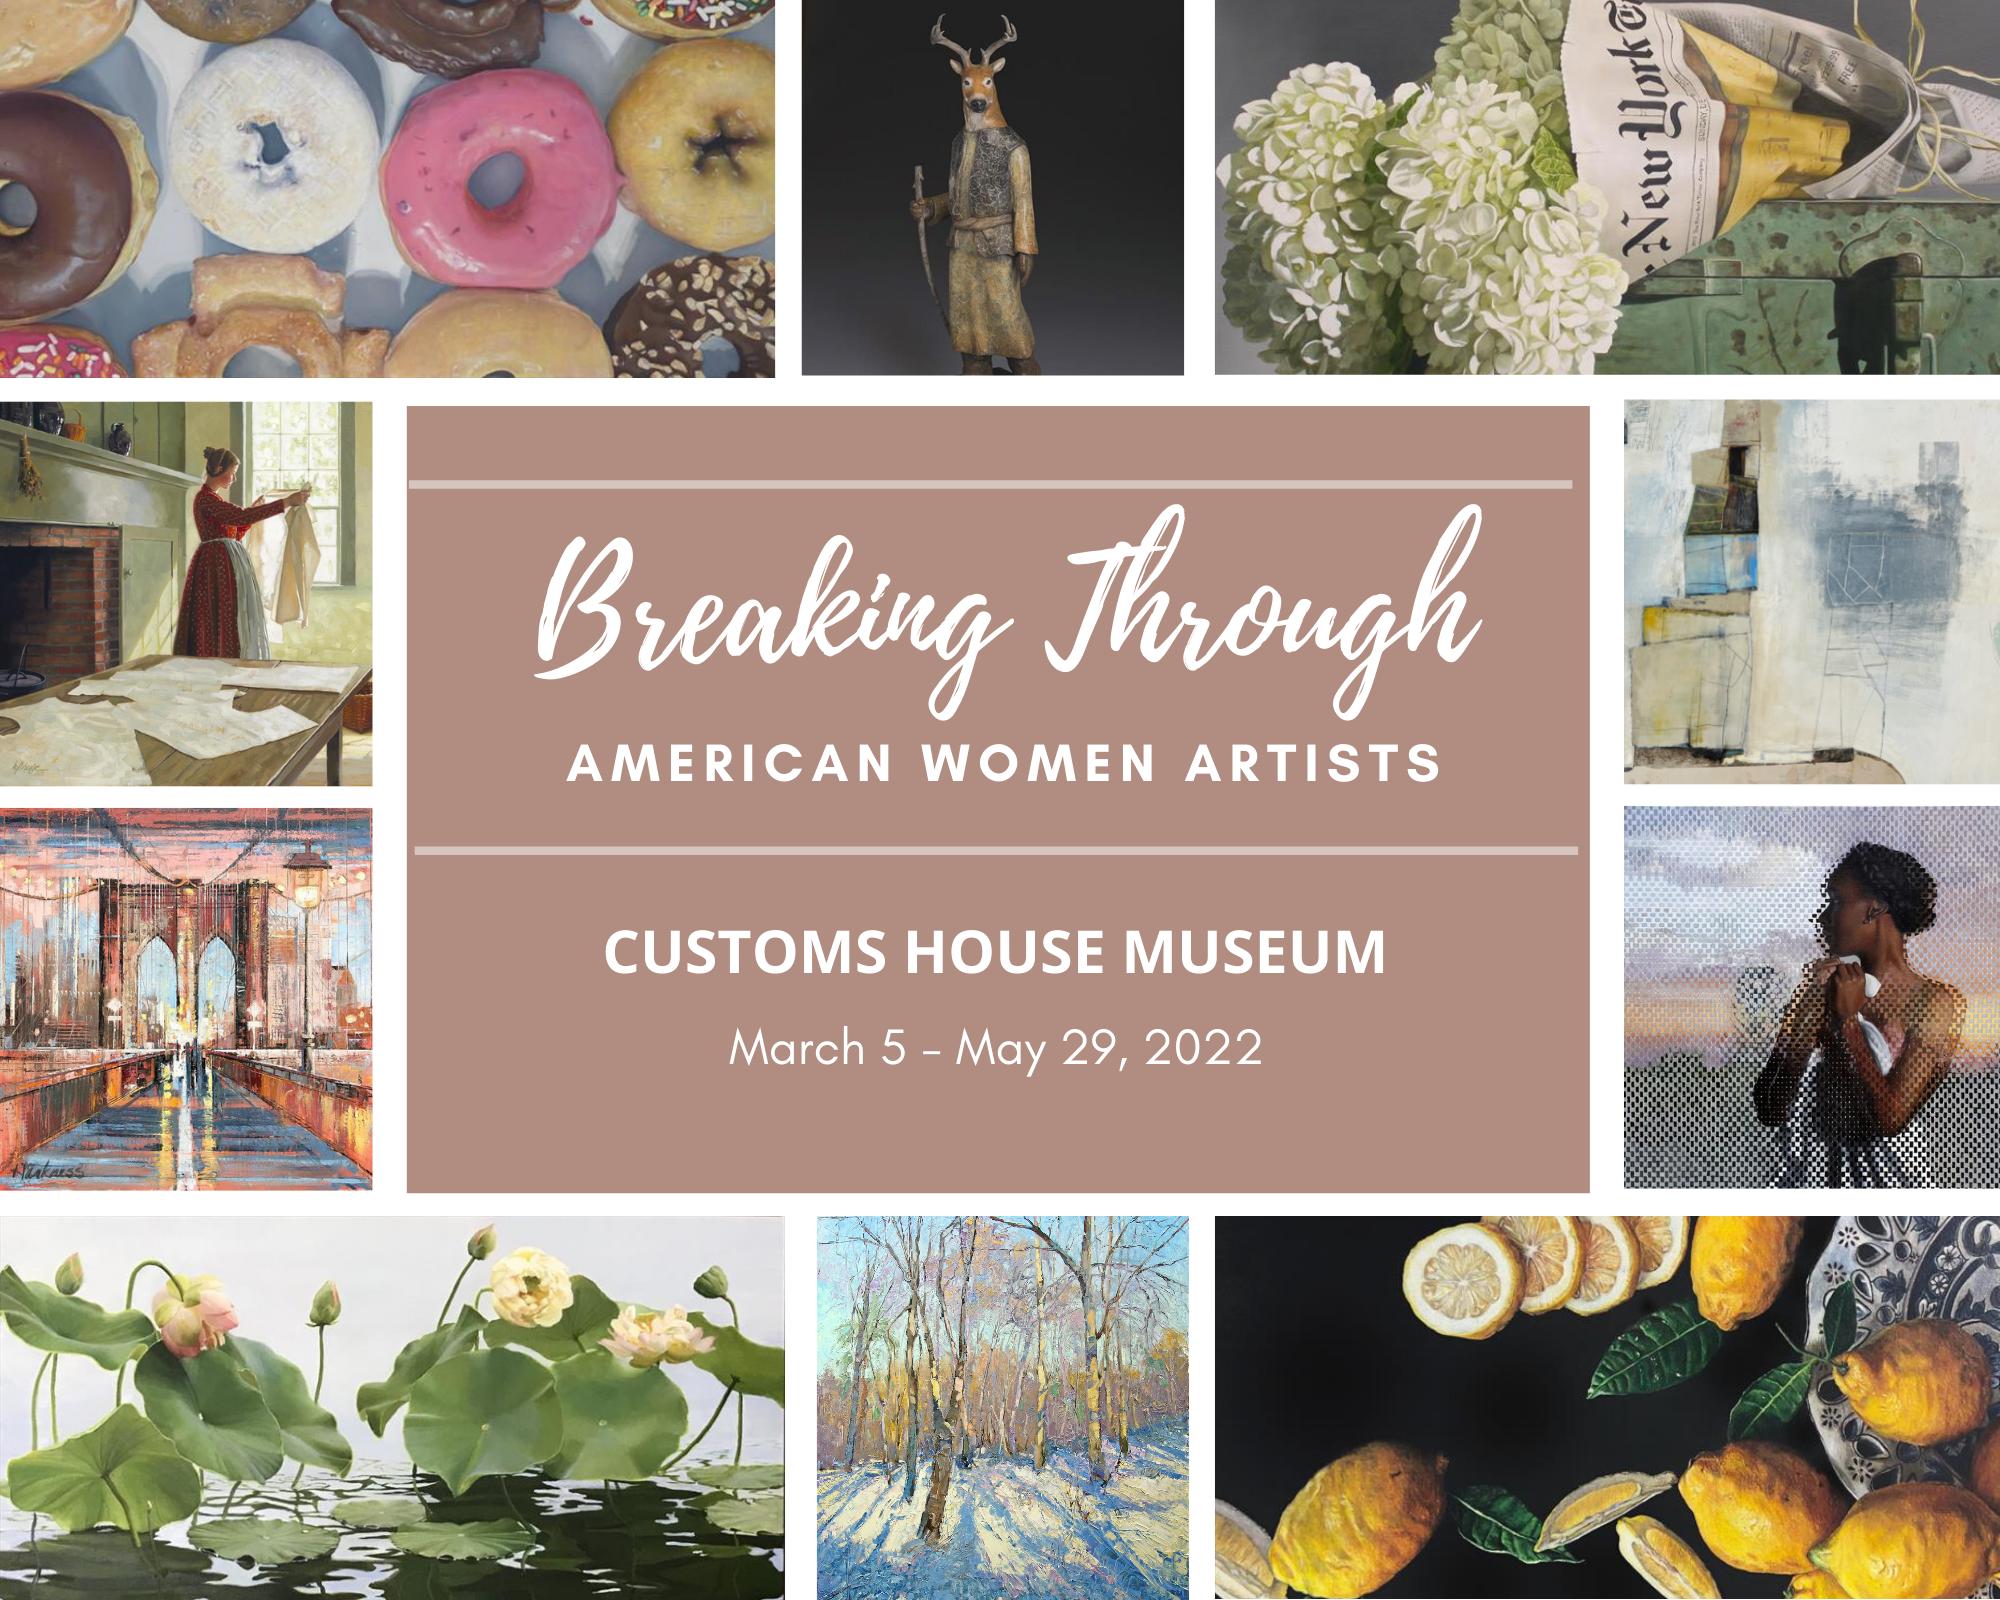 2022 Museum Show Announced